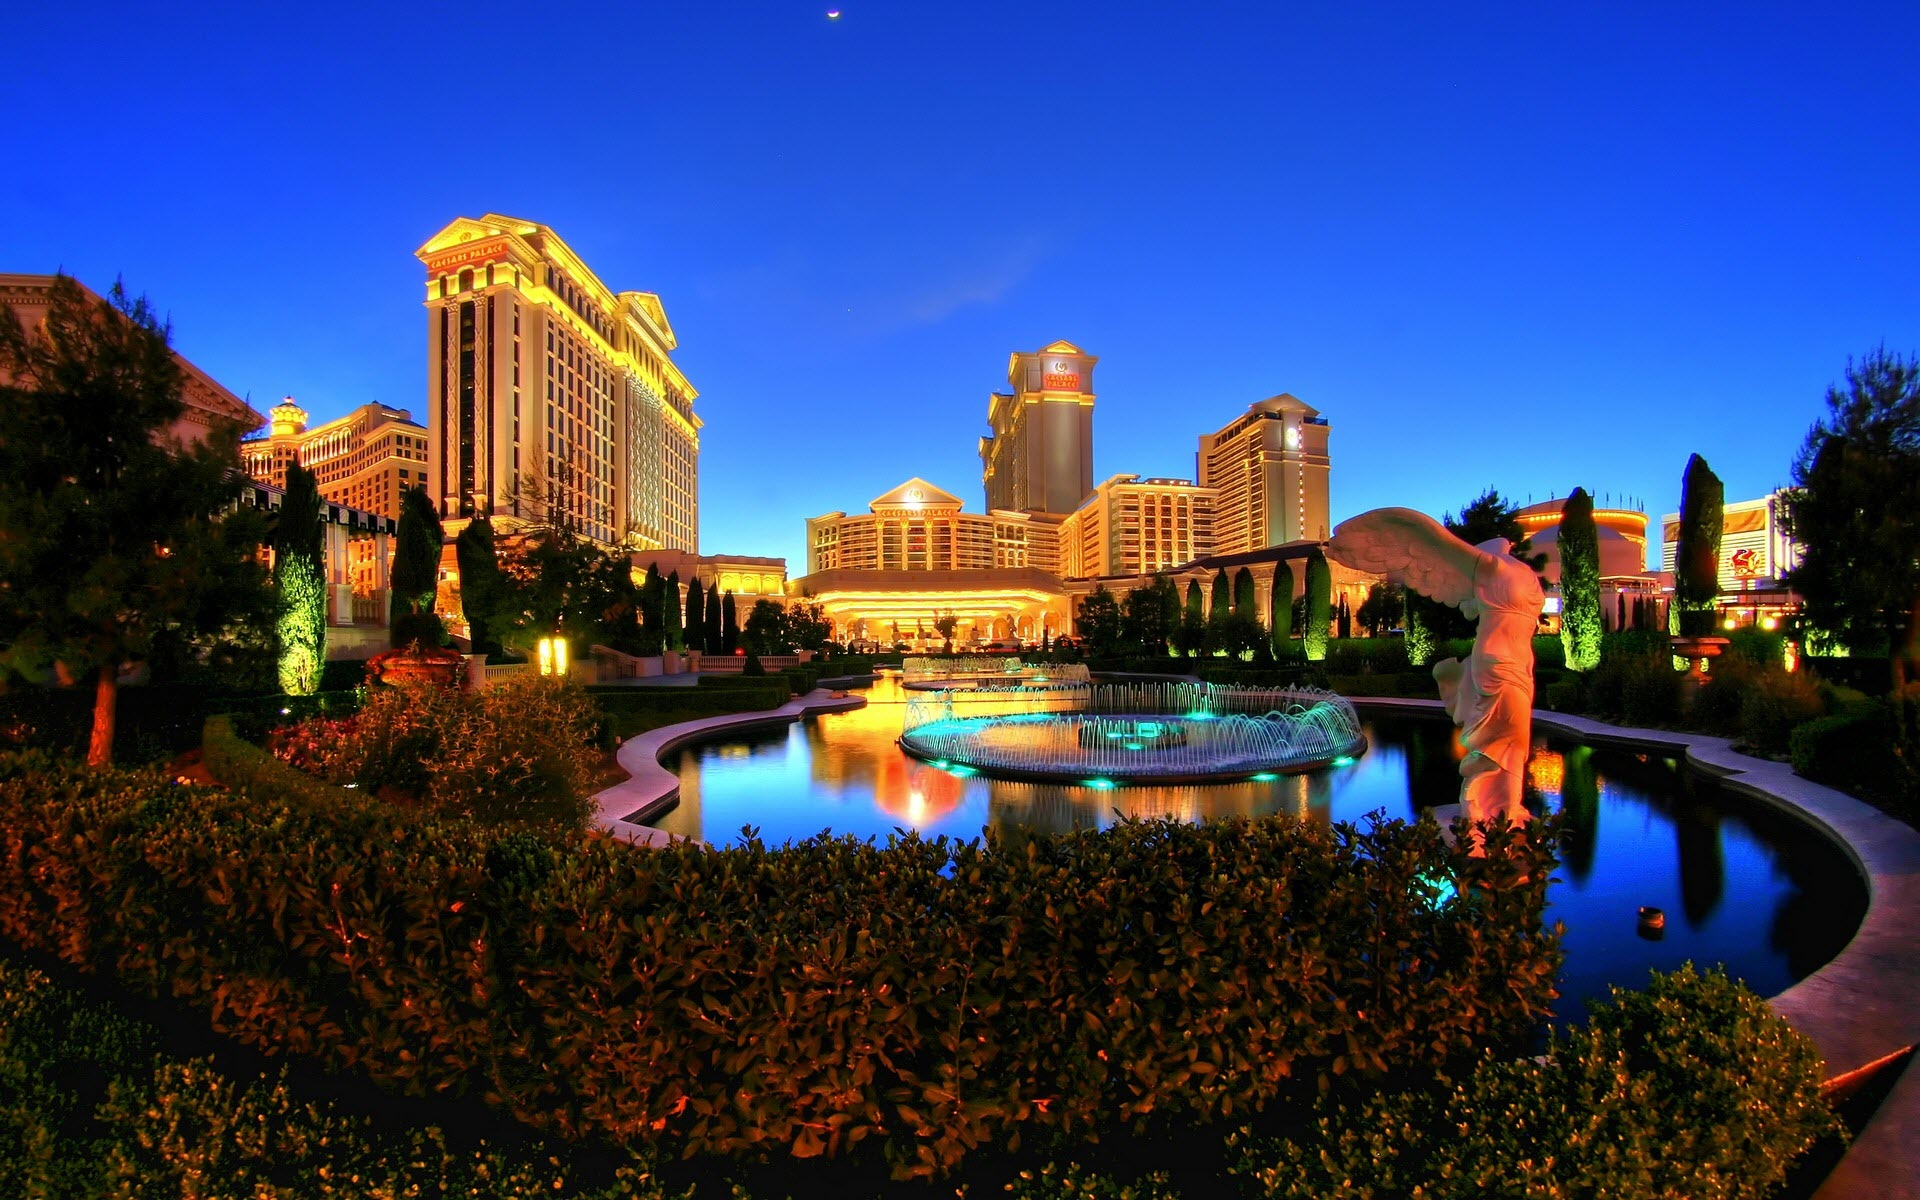 44+ Las Vegas Casino Wallpaper on WallpaperSafari